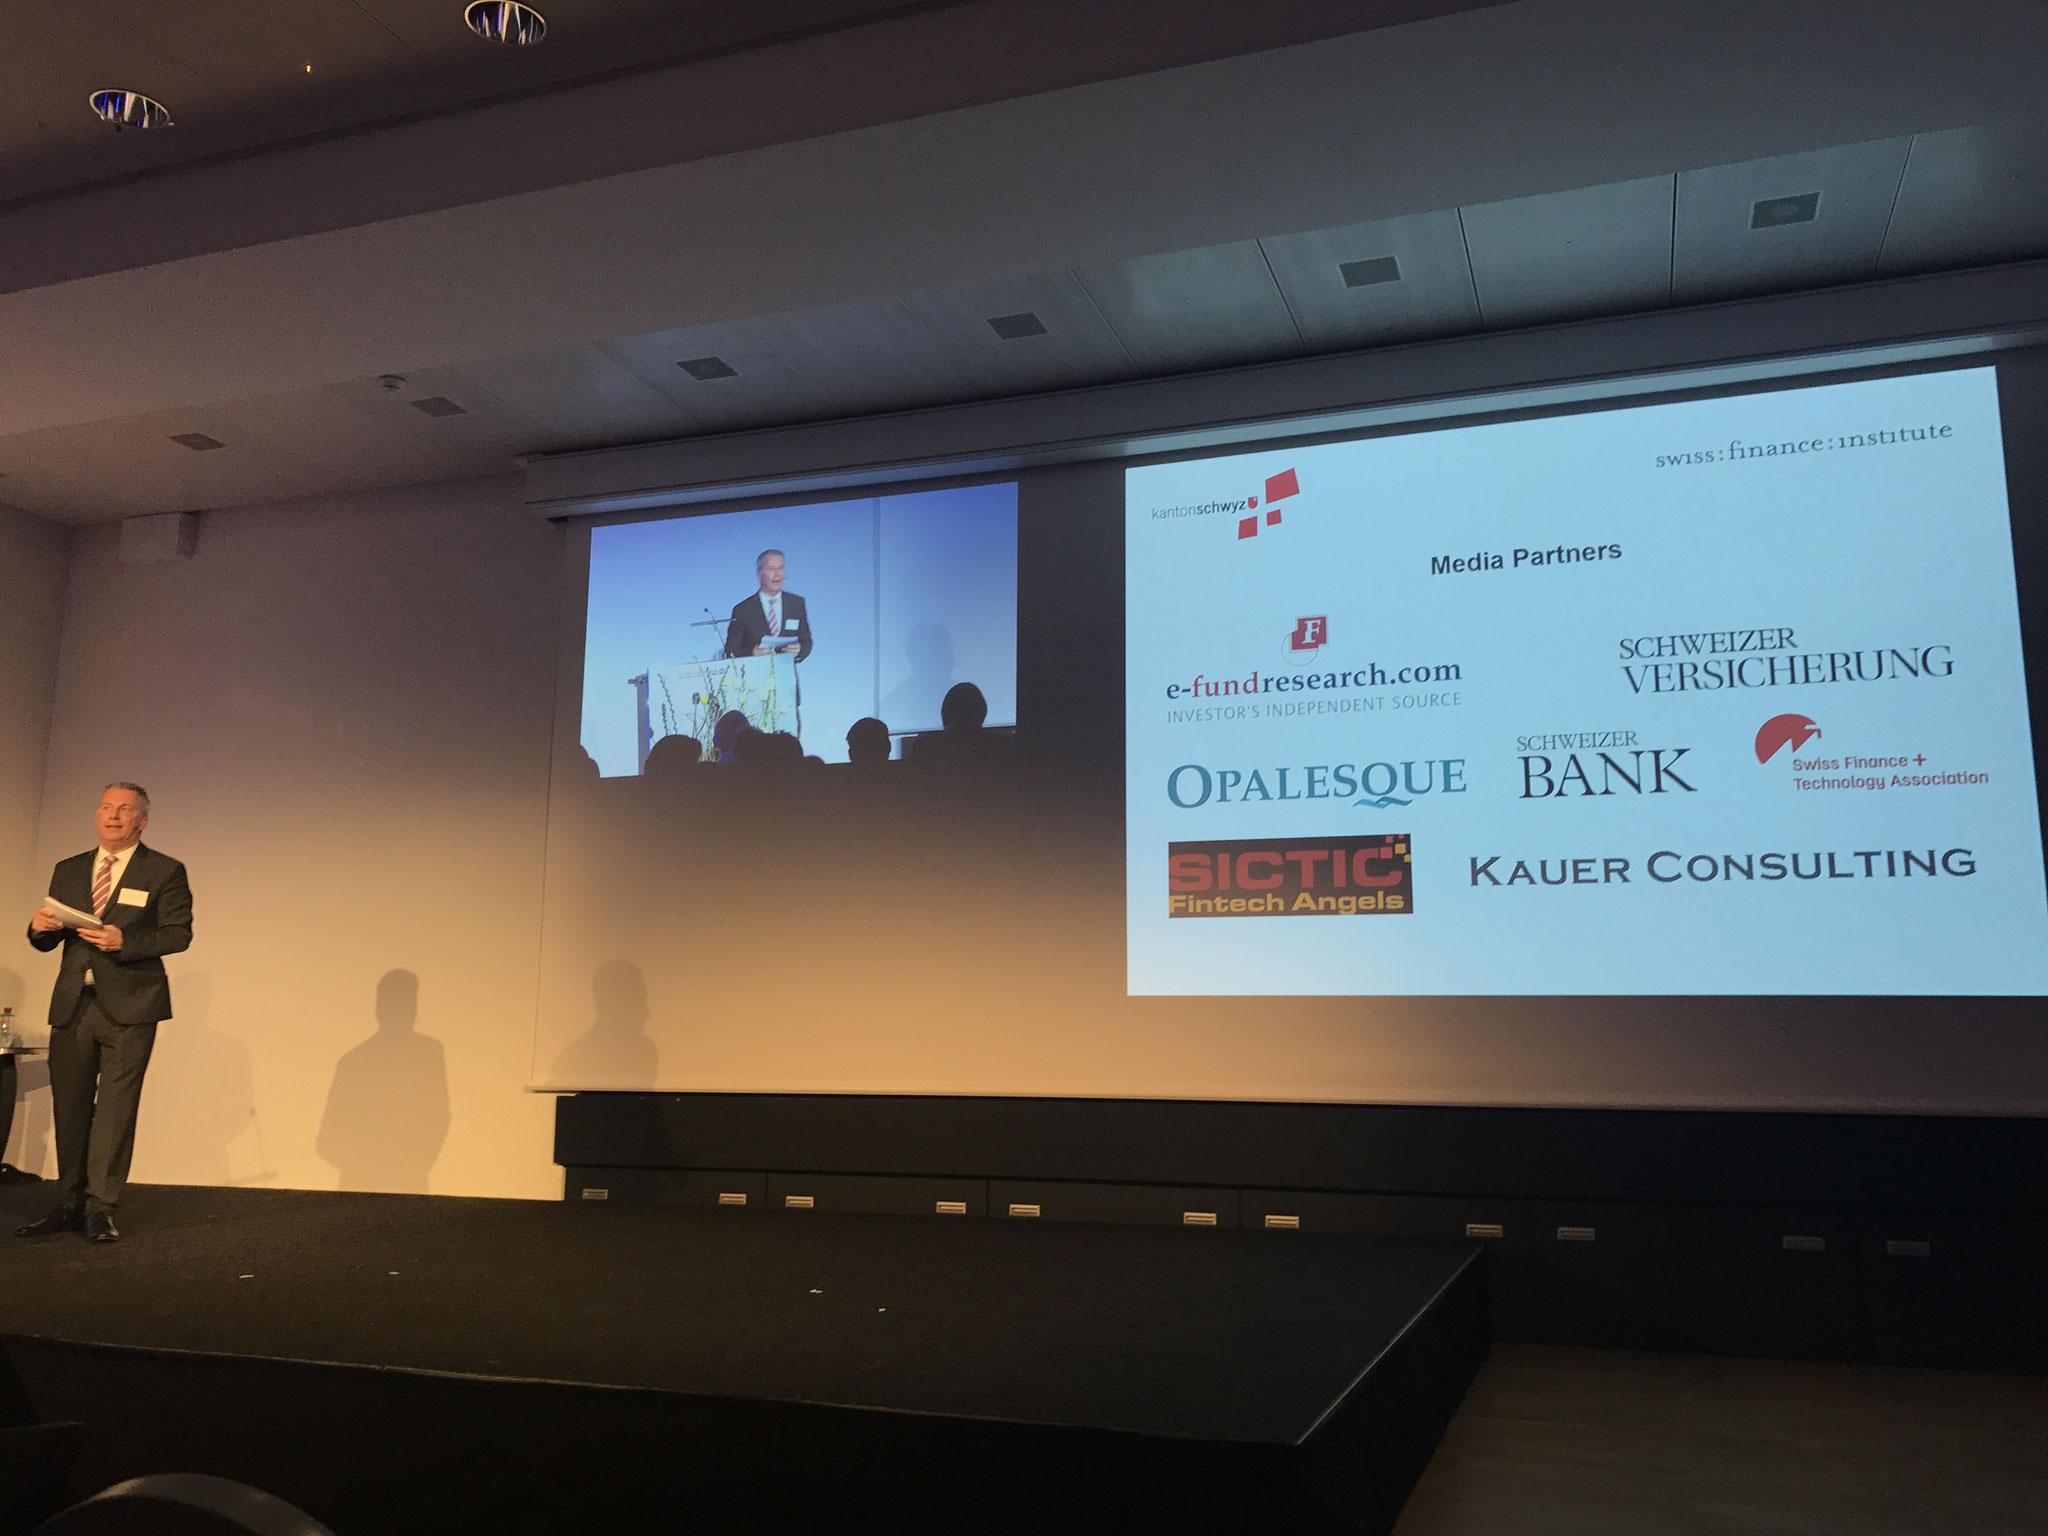 Swiss Asset Management Day 2017: Media Relations (Hyperlink: Webpage, siehe rechte Seite, Sektion Media)